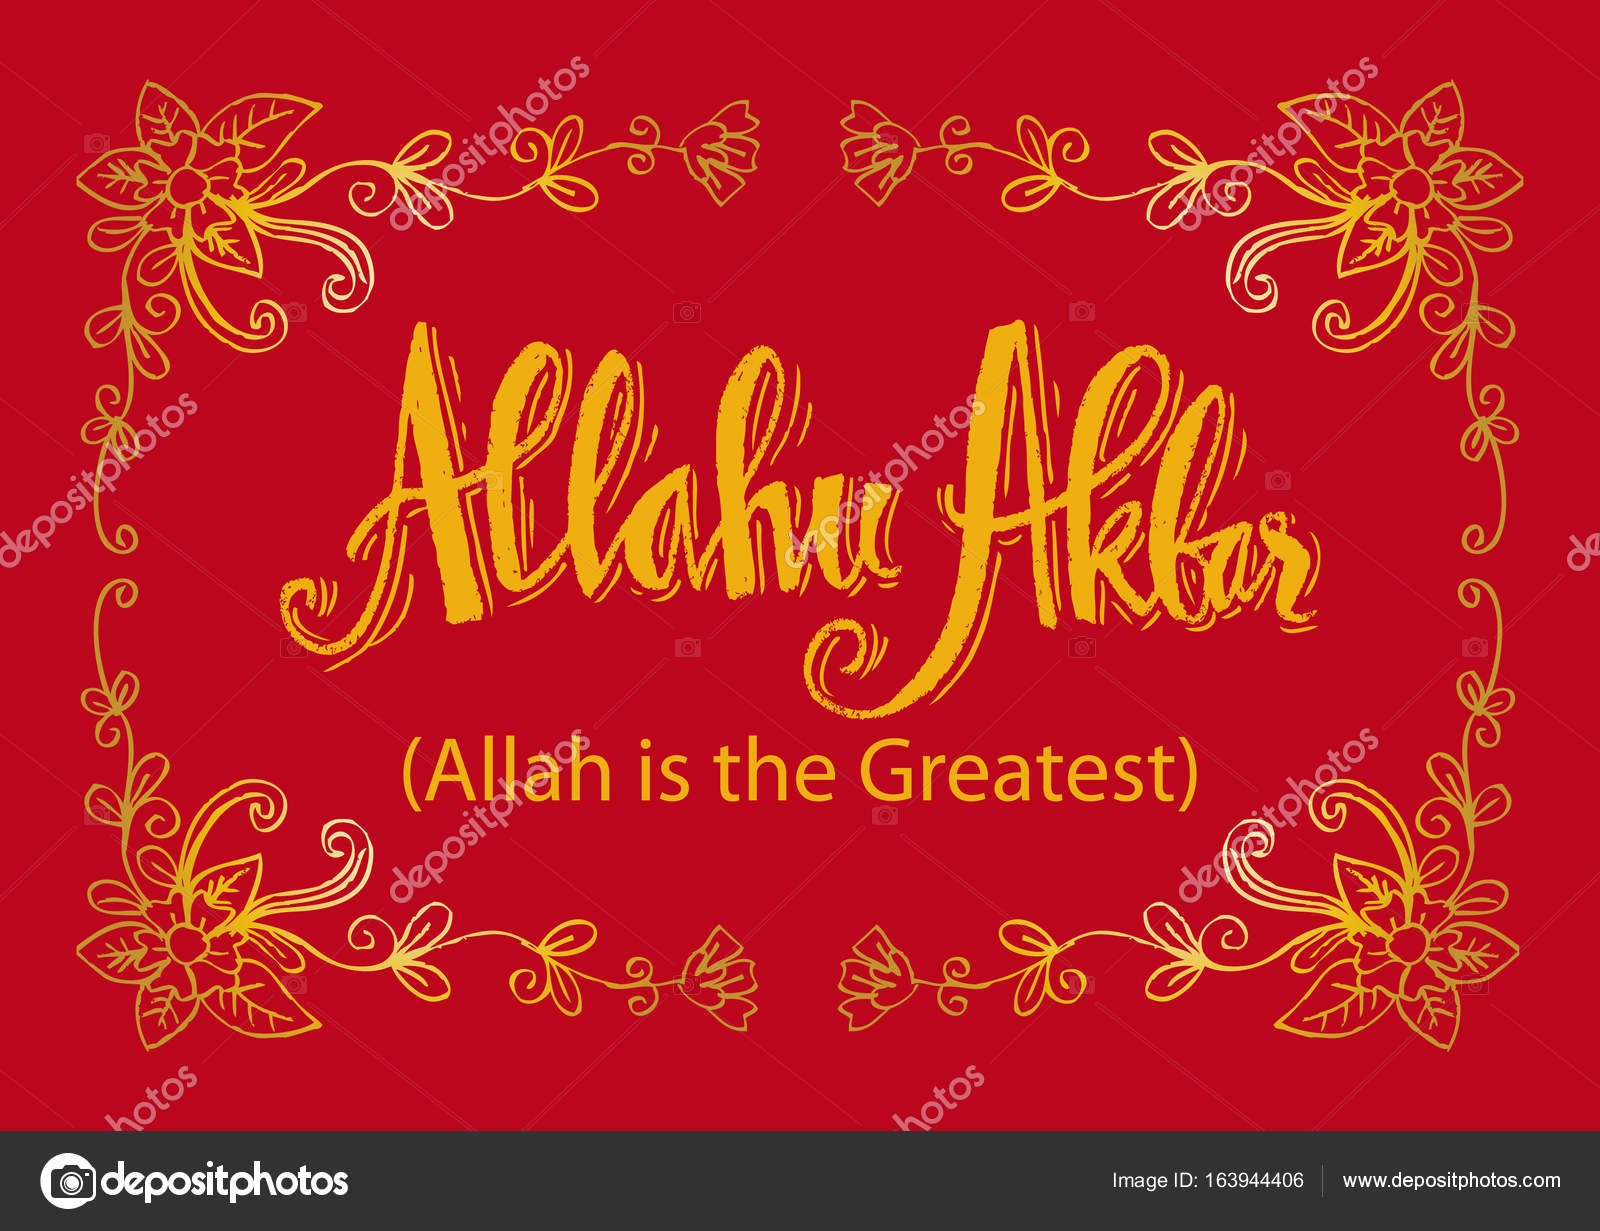 Allah Akbar Musique allahu akbar allah is the greatest — stock photo © handini #163944406